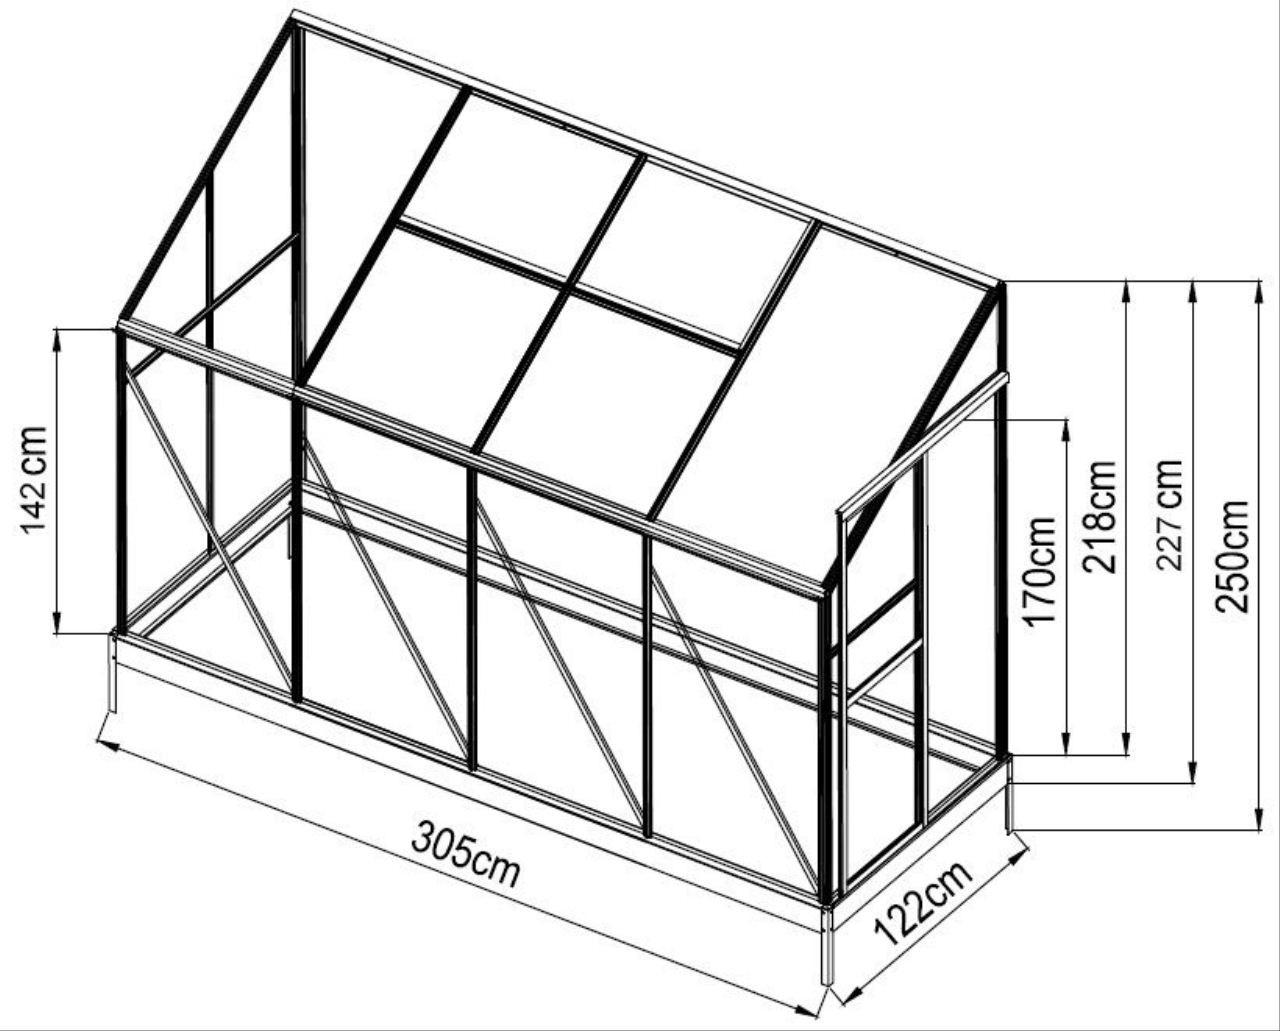 3 72m profi anlehn gew chshaus anlehngew chshaus. Black Bedroom Furniture Sets. Home Design Ideas